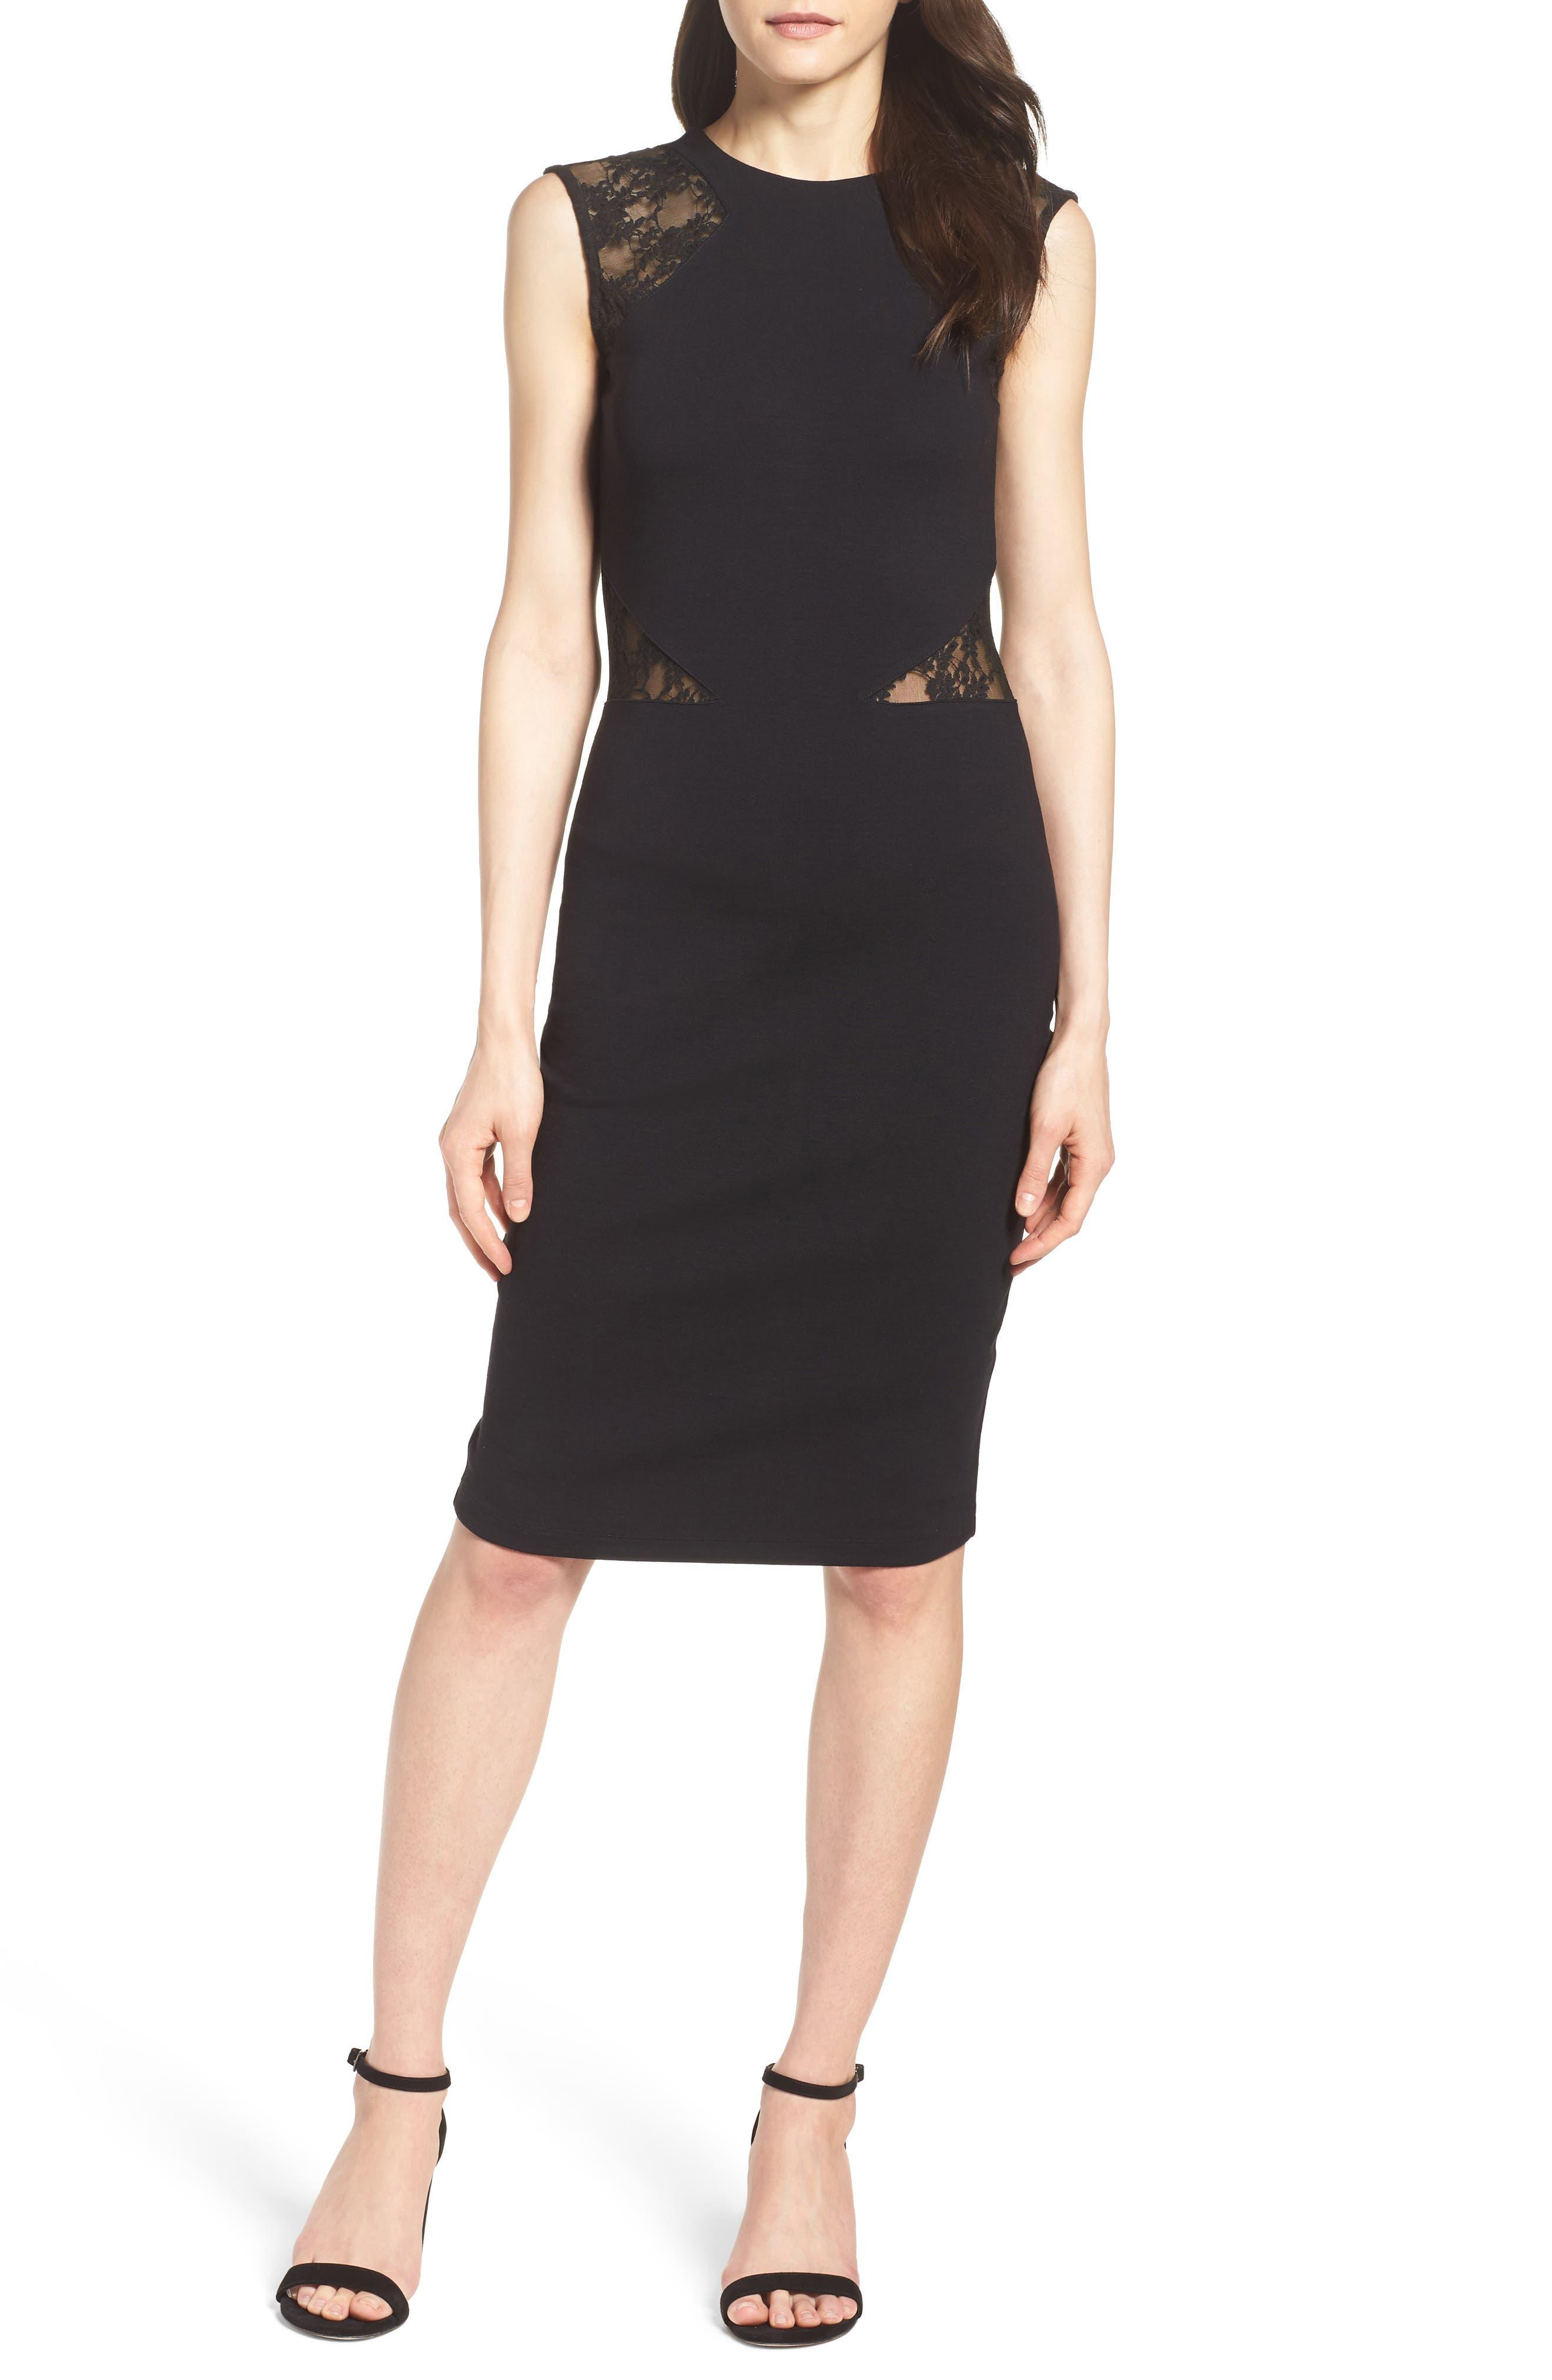 Viven Dress,                             Main thumbnail 1, color,                             001